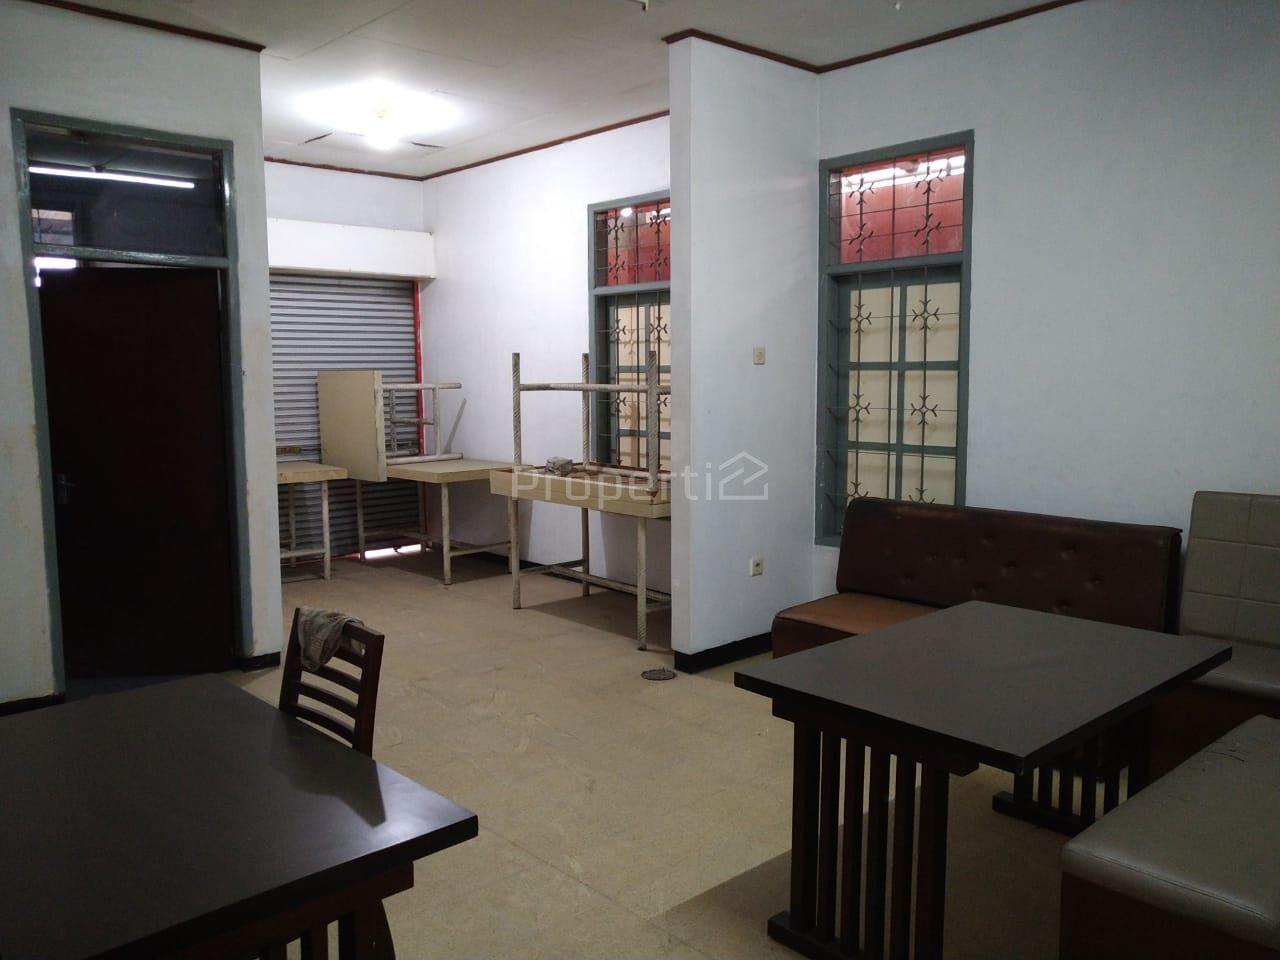 Rumah Siap Huni di Melong, Cimahi Selatan, Kota Cimahi